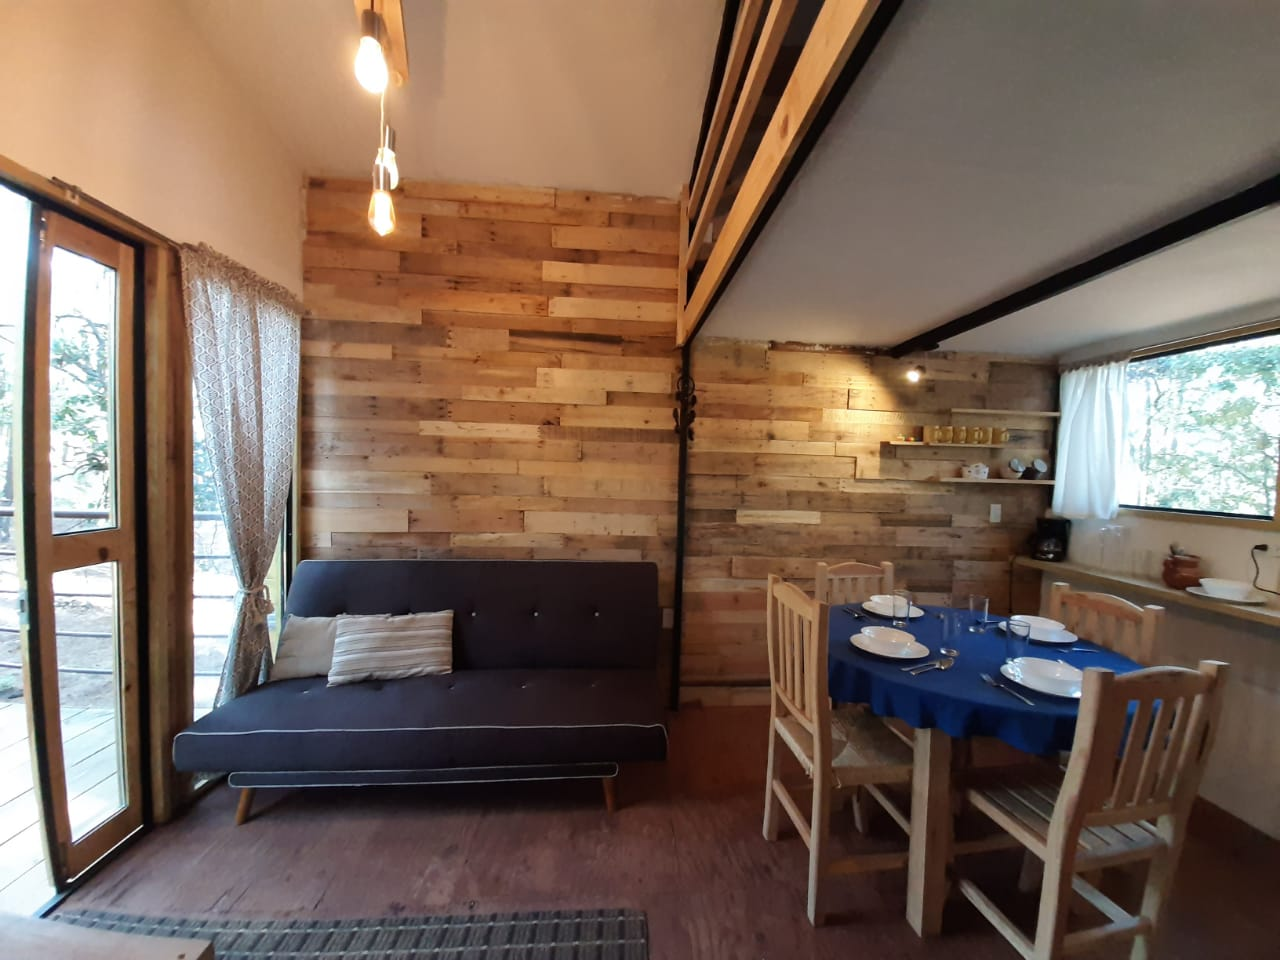 interior_cabaña_huasca1